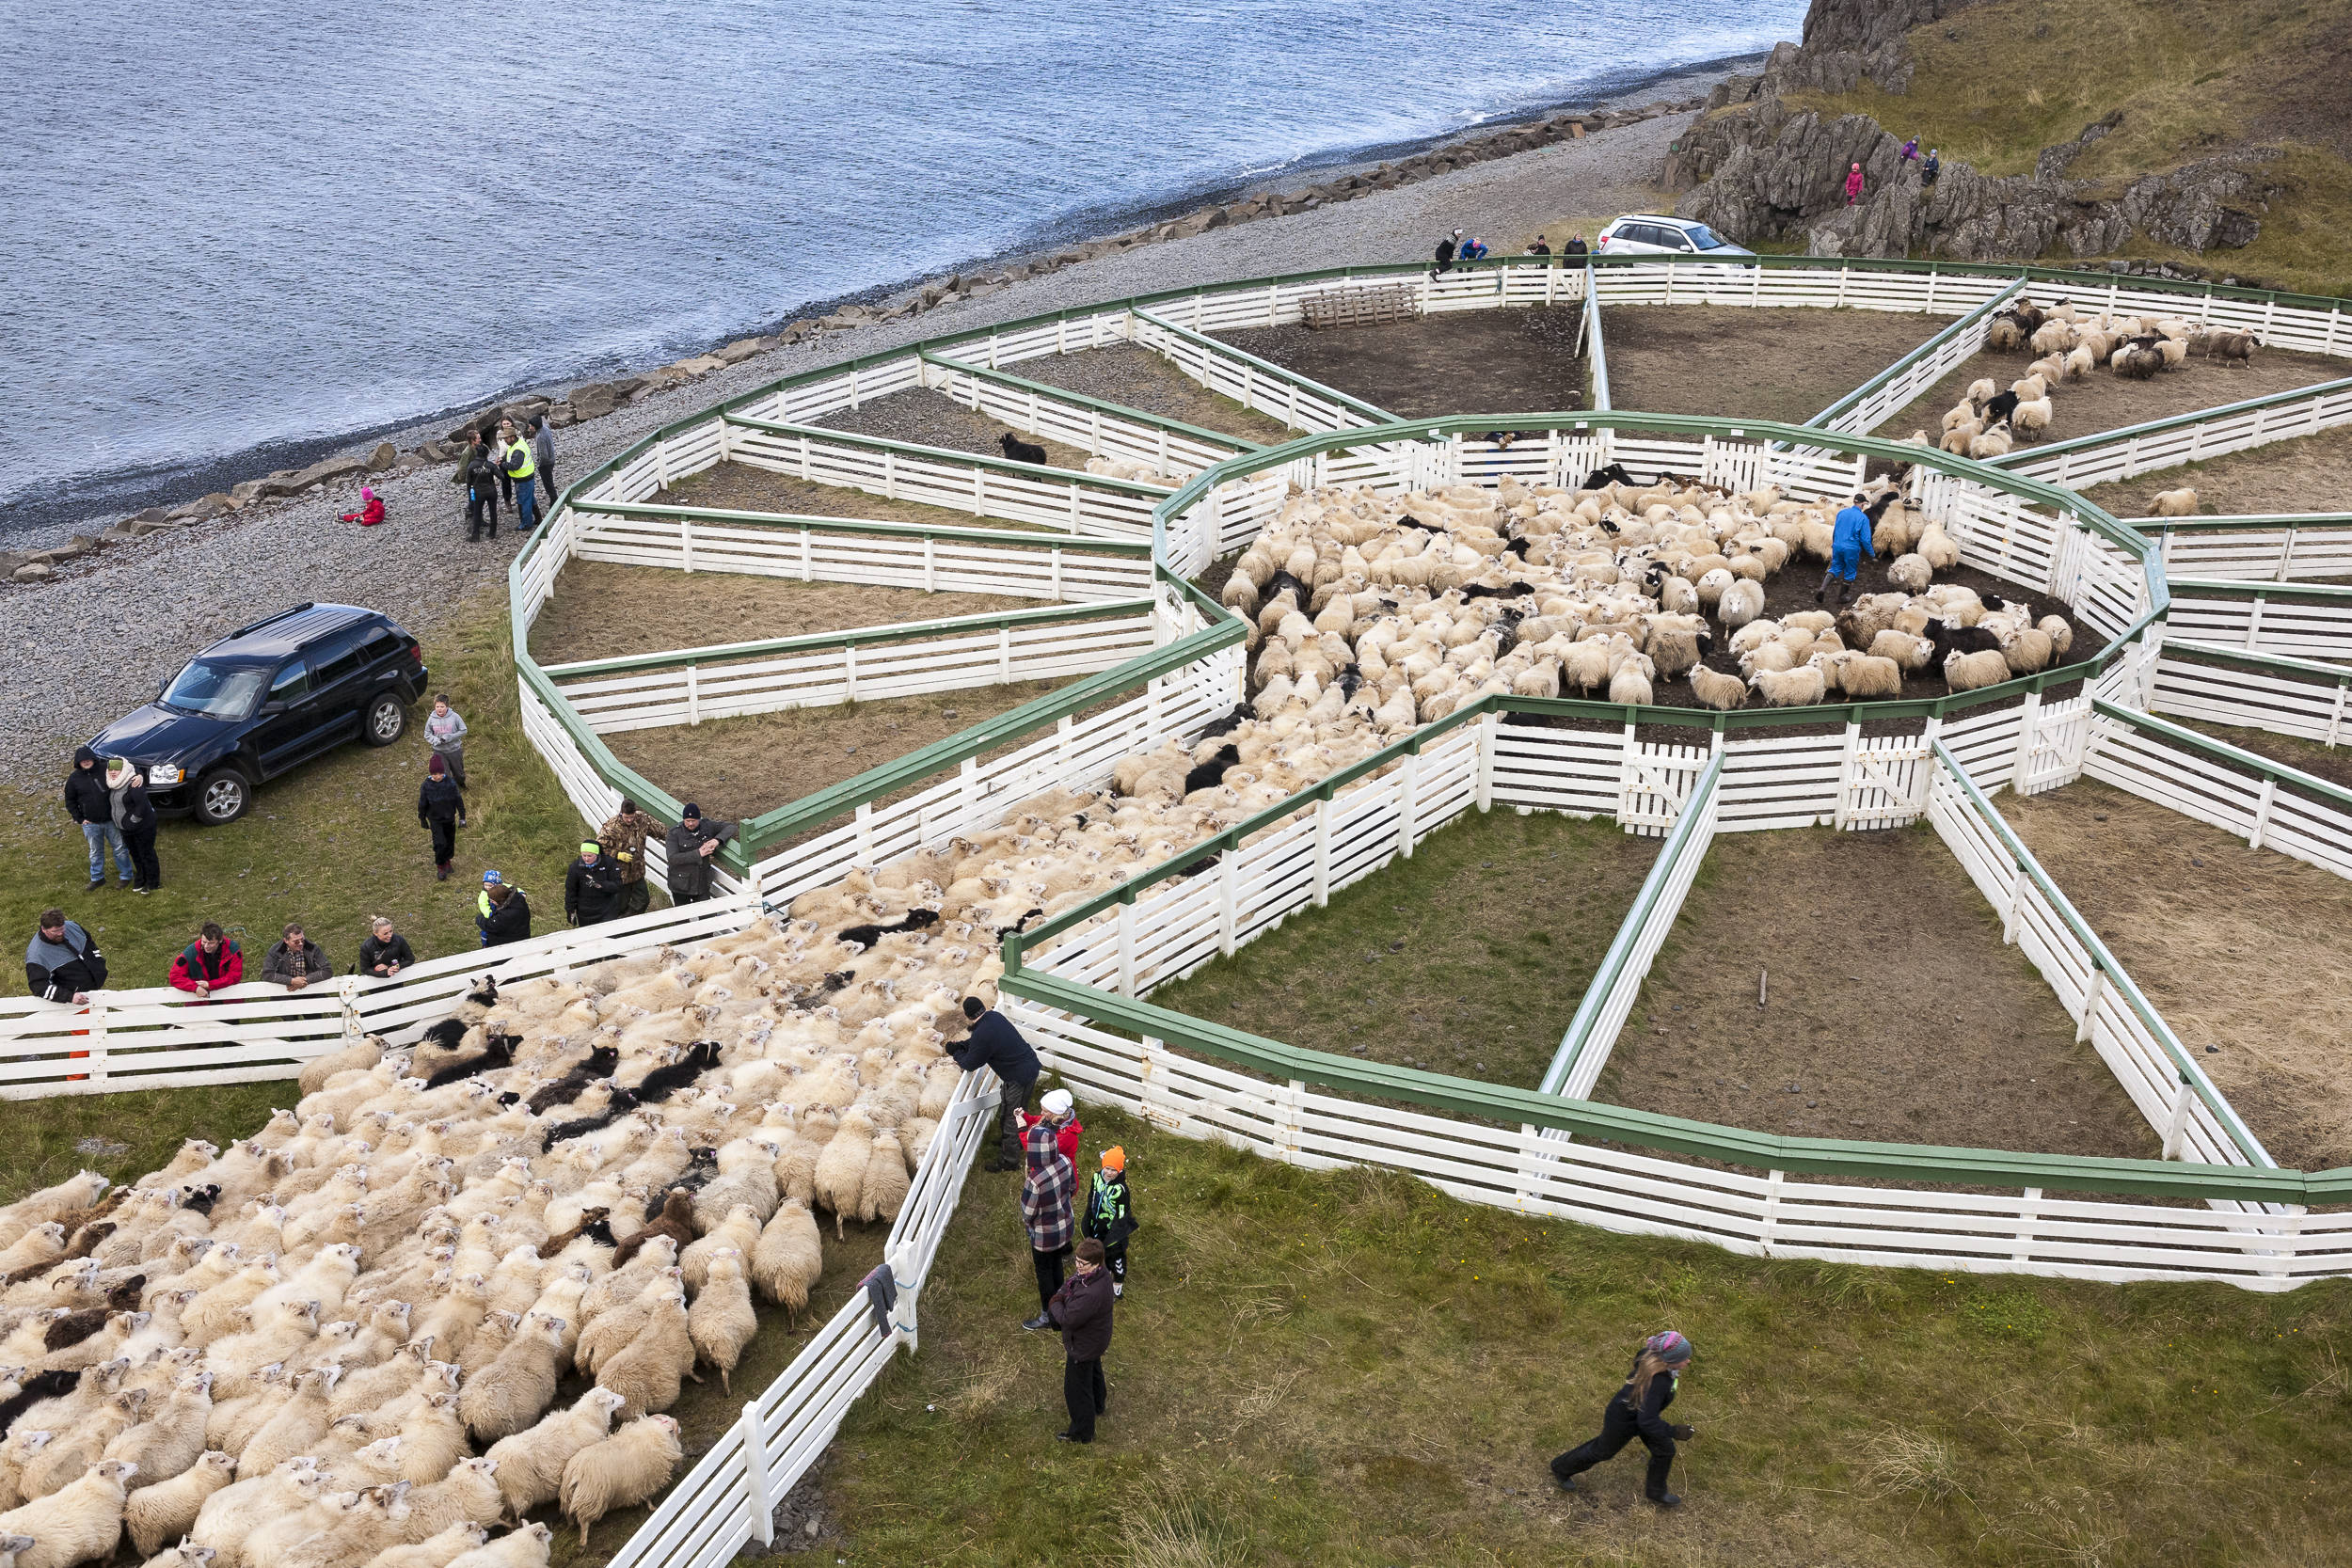 Sheep_006